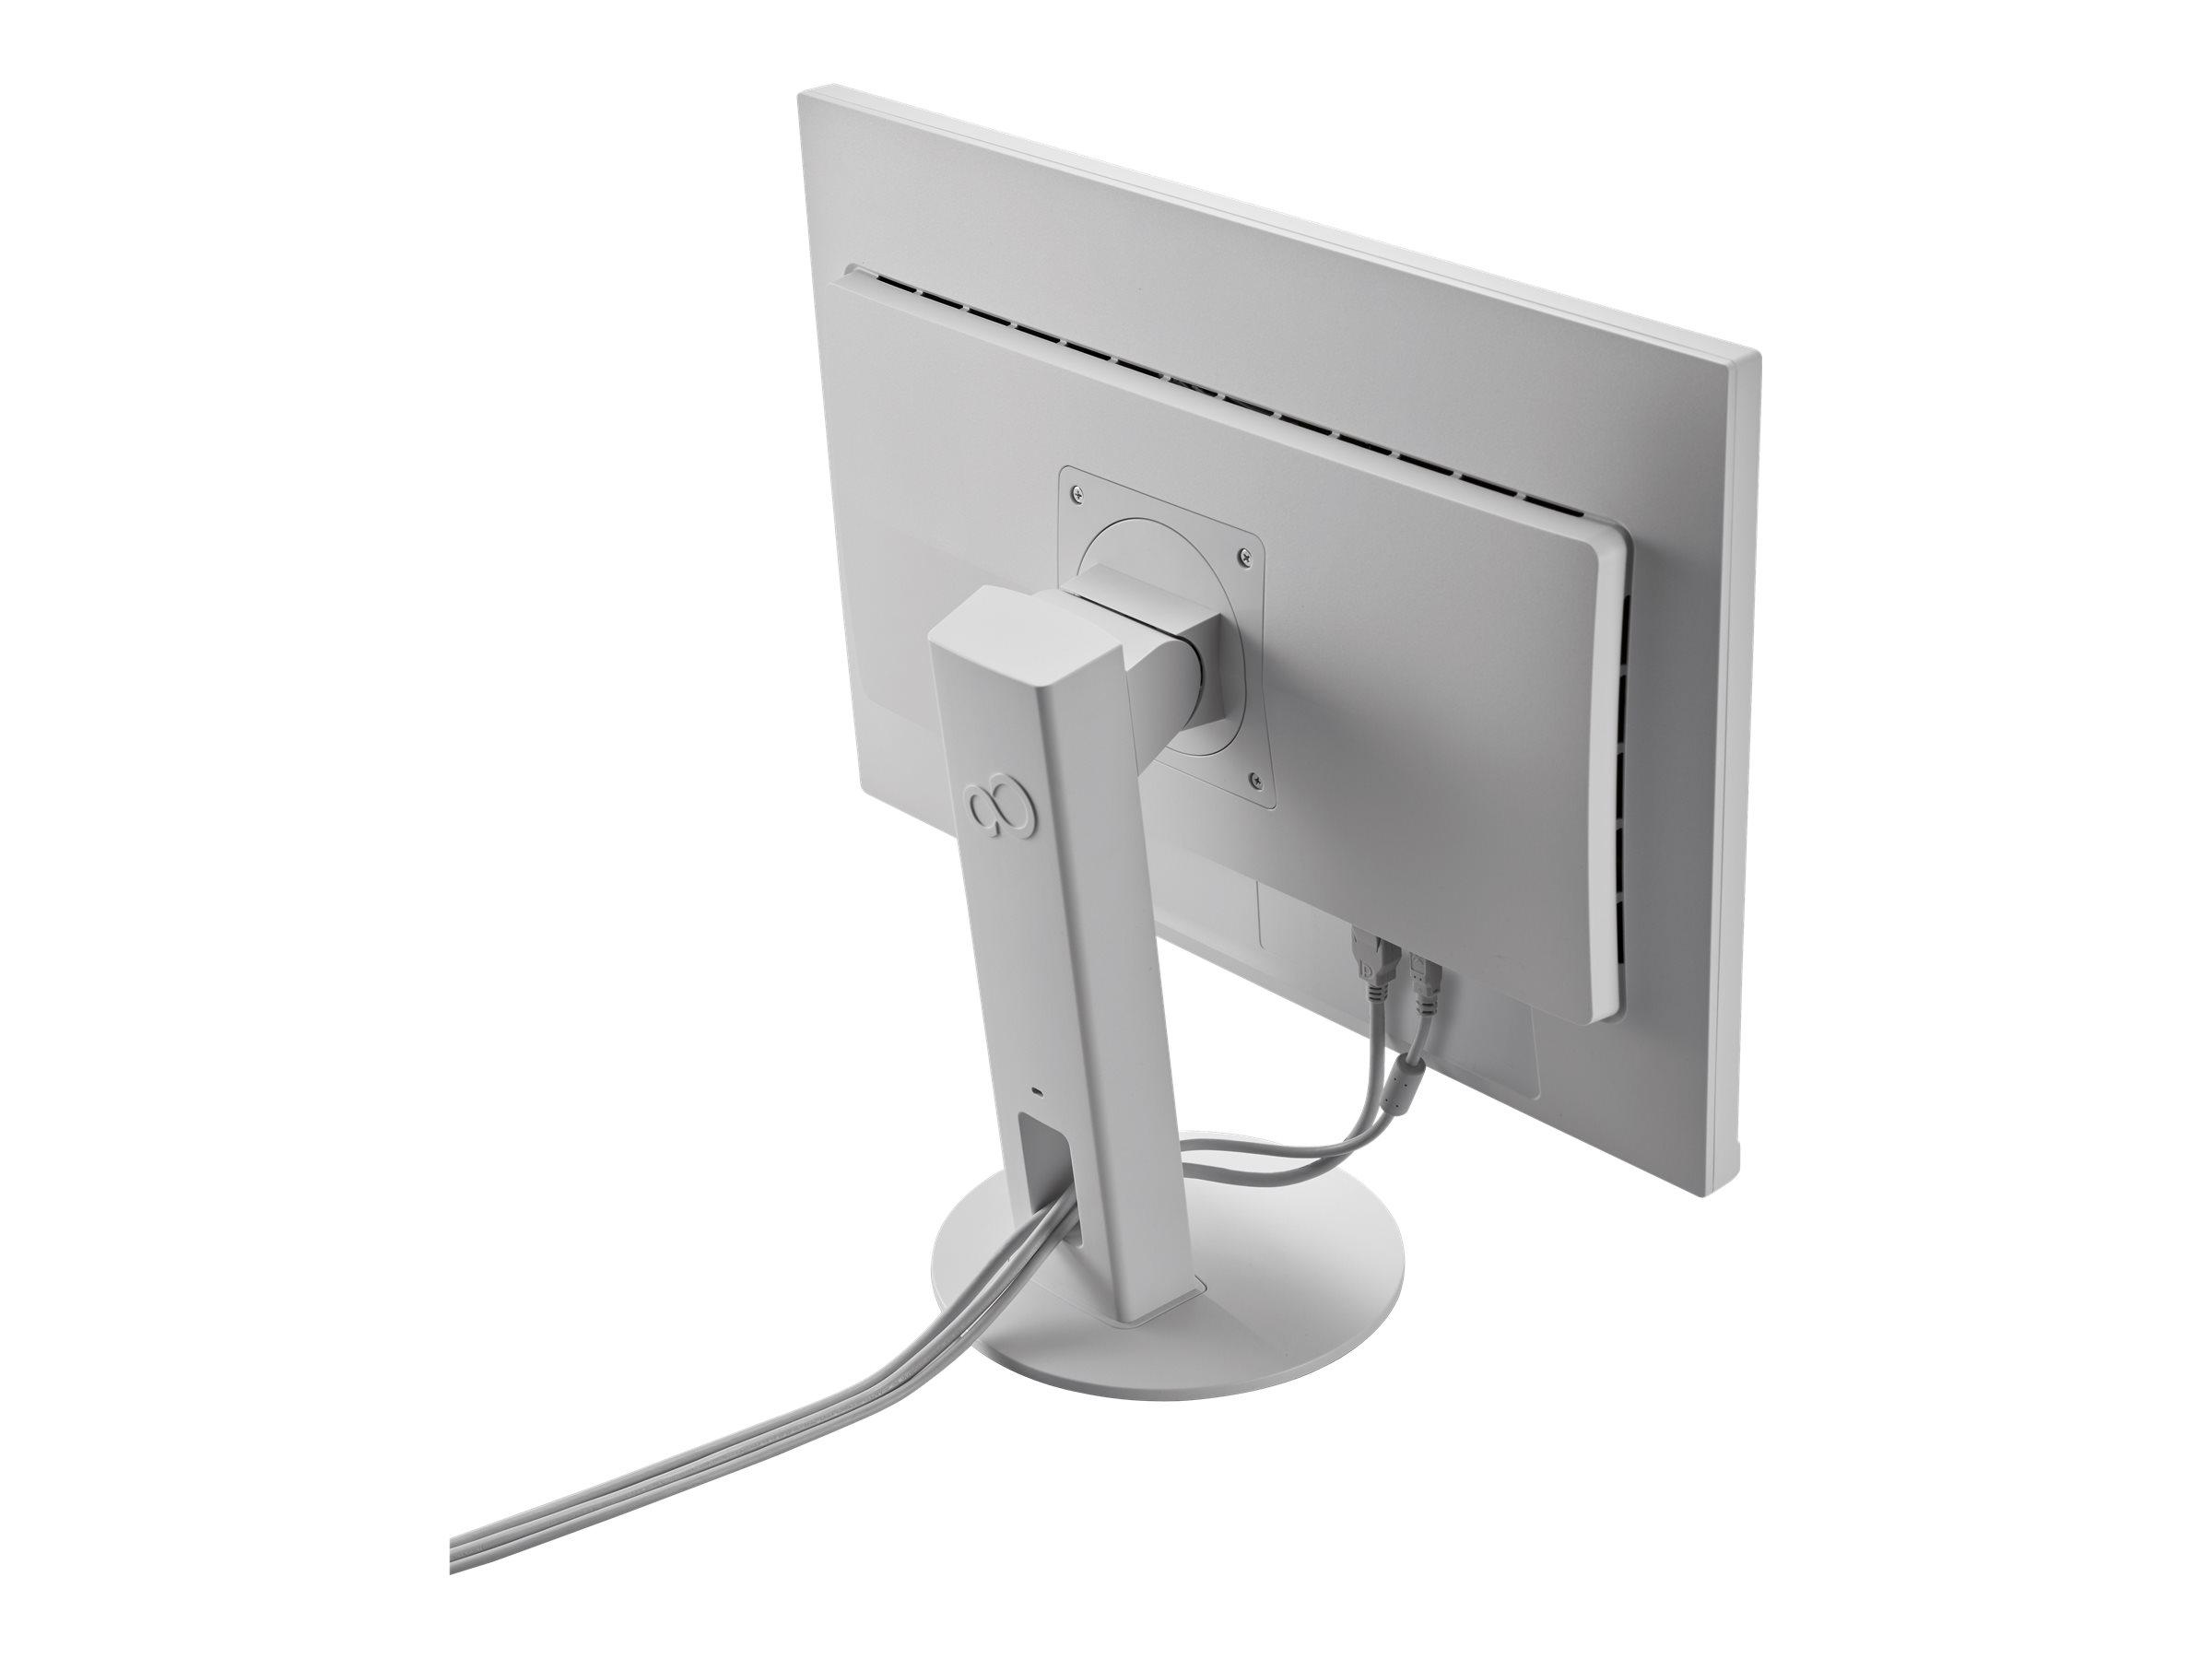 "Fujitsu P24-8 WE Neo - Kein Standfuß - LED-Monitor - 61 cm (24"")"